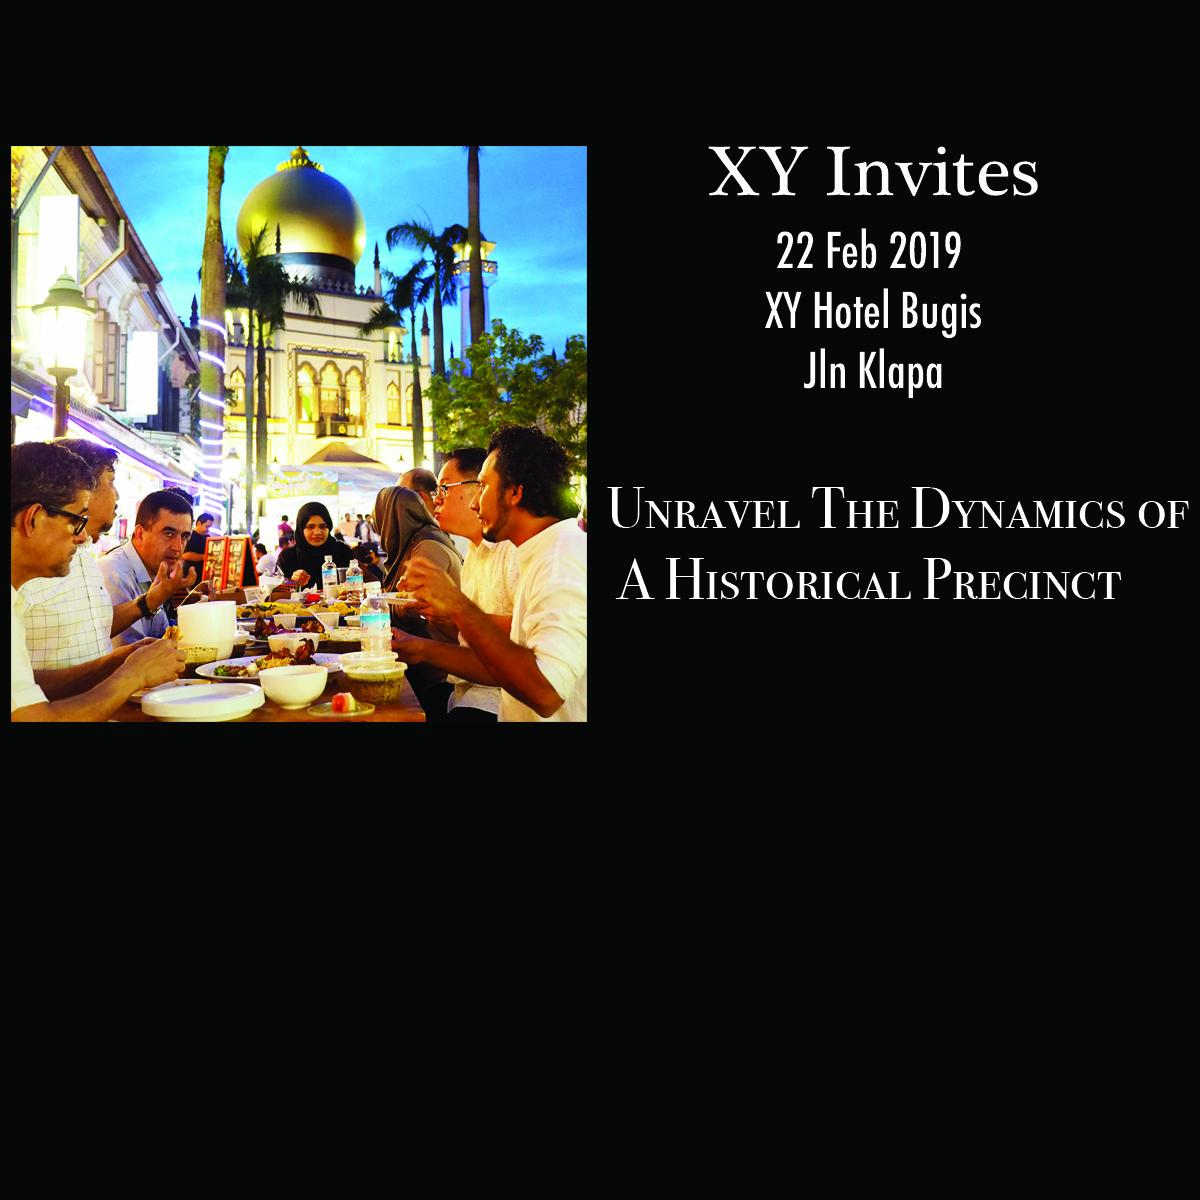 xy invites jpeg